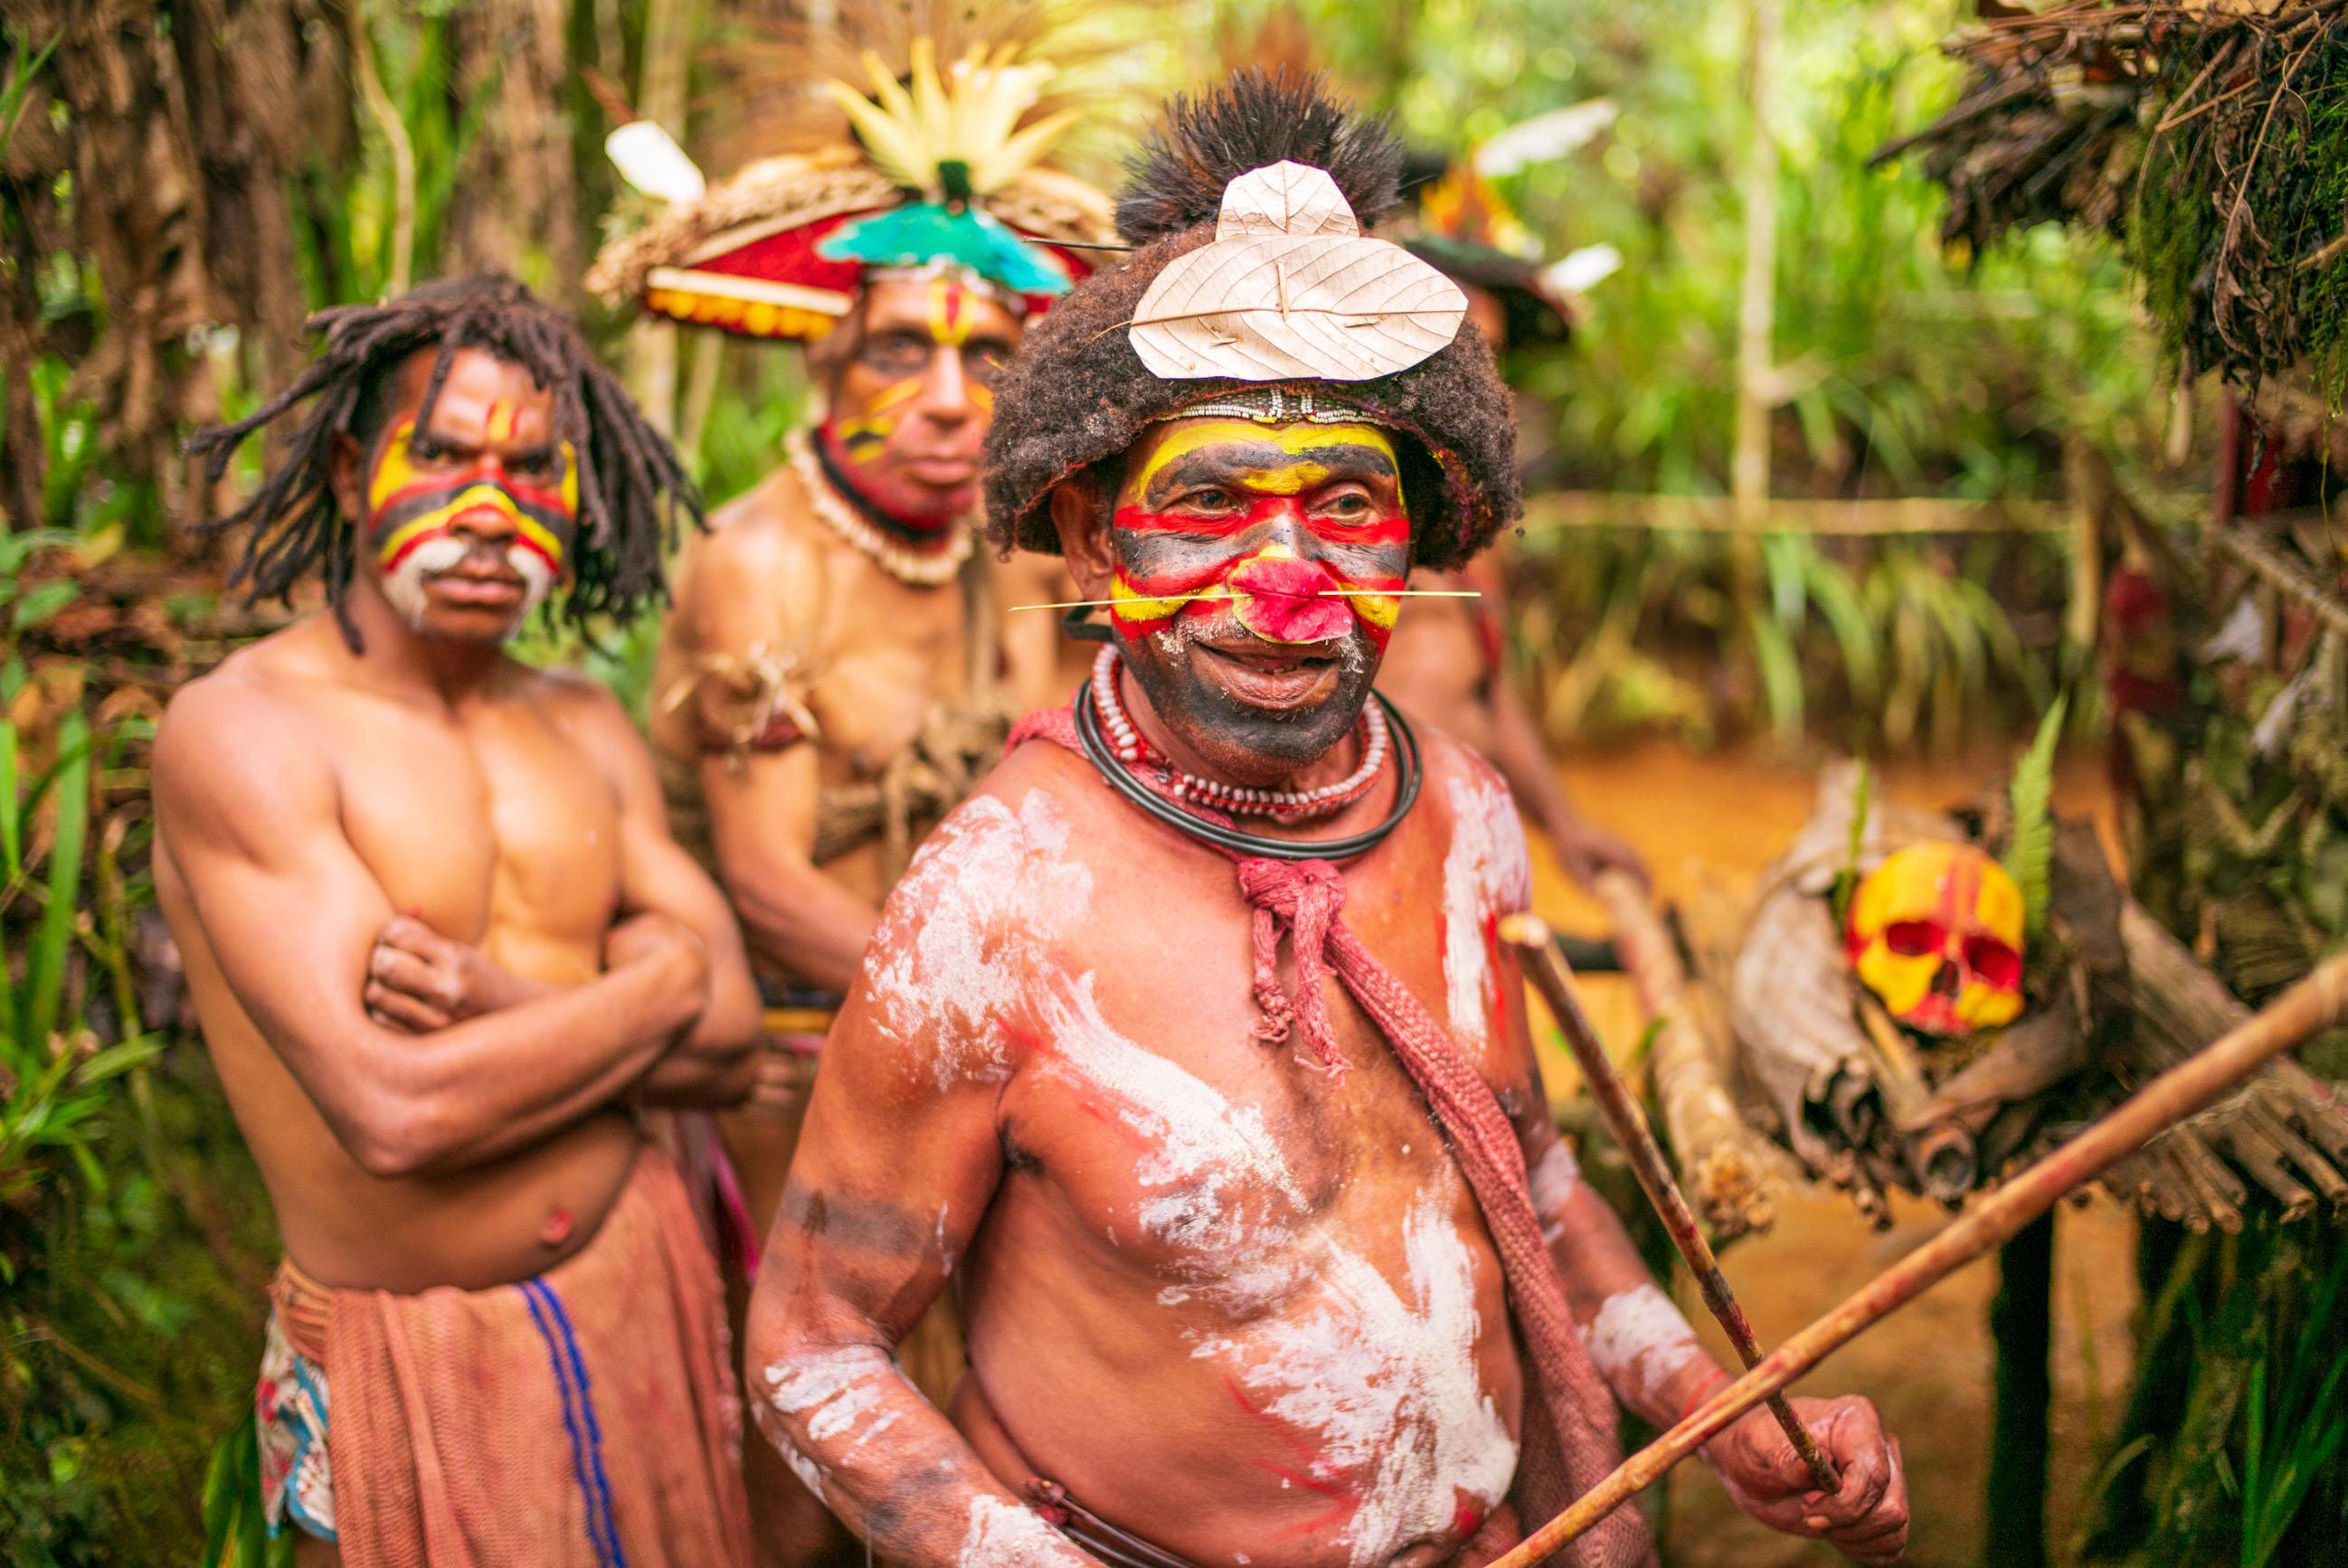 https://bubo.sk/uploads/galleries/7442/lubosfellner_papuanovaguinea_l1008116.jpg